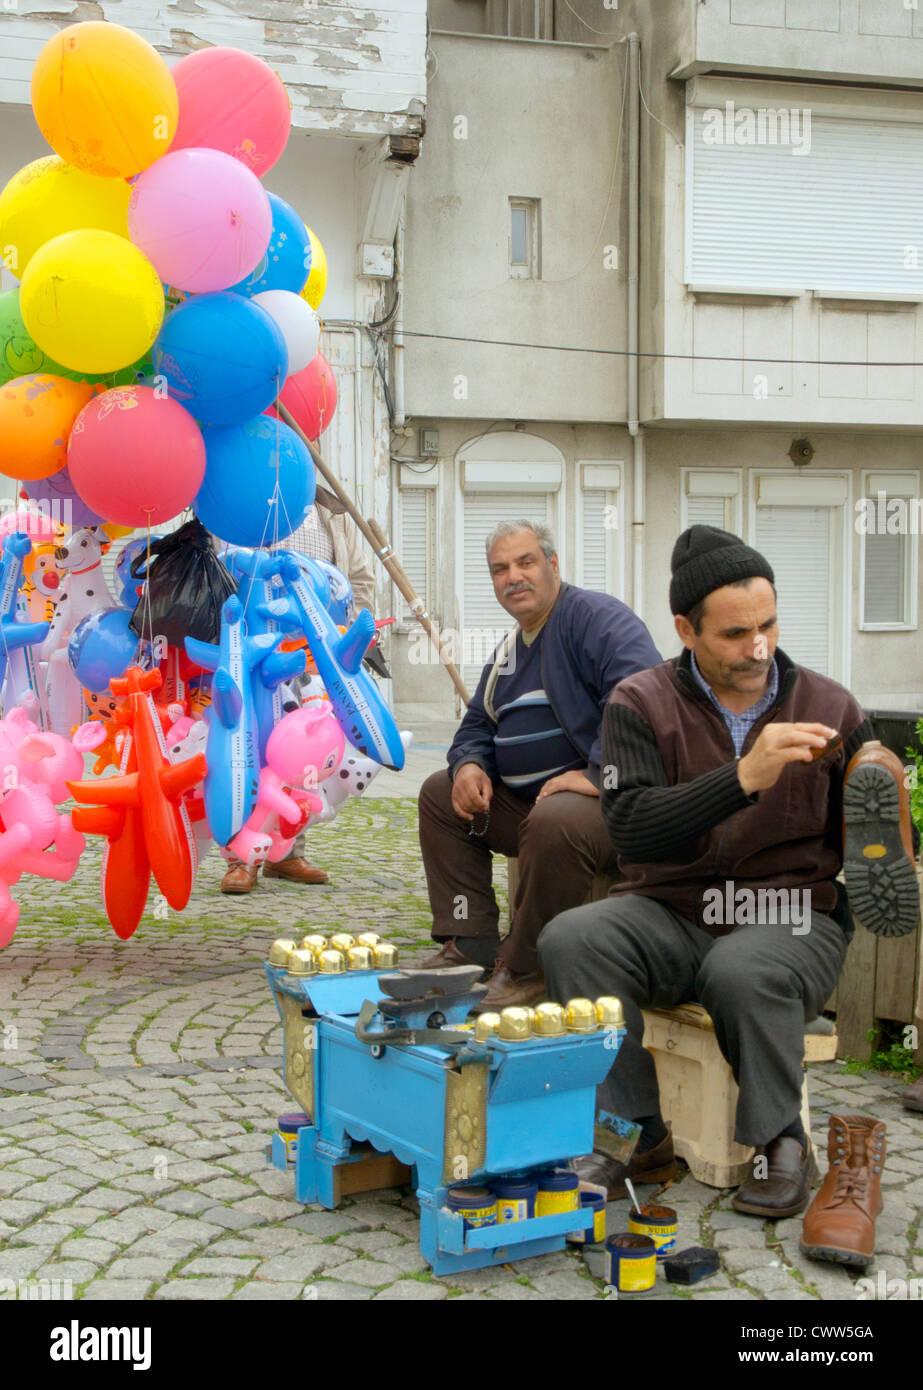 Türkei, Istanbul, Beylerbey, Schuhputzer und Luftballonverkäufer. - Stock Image